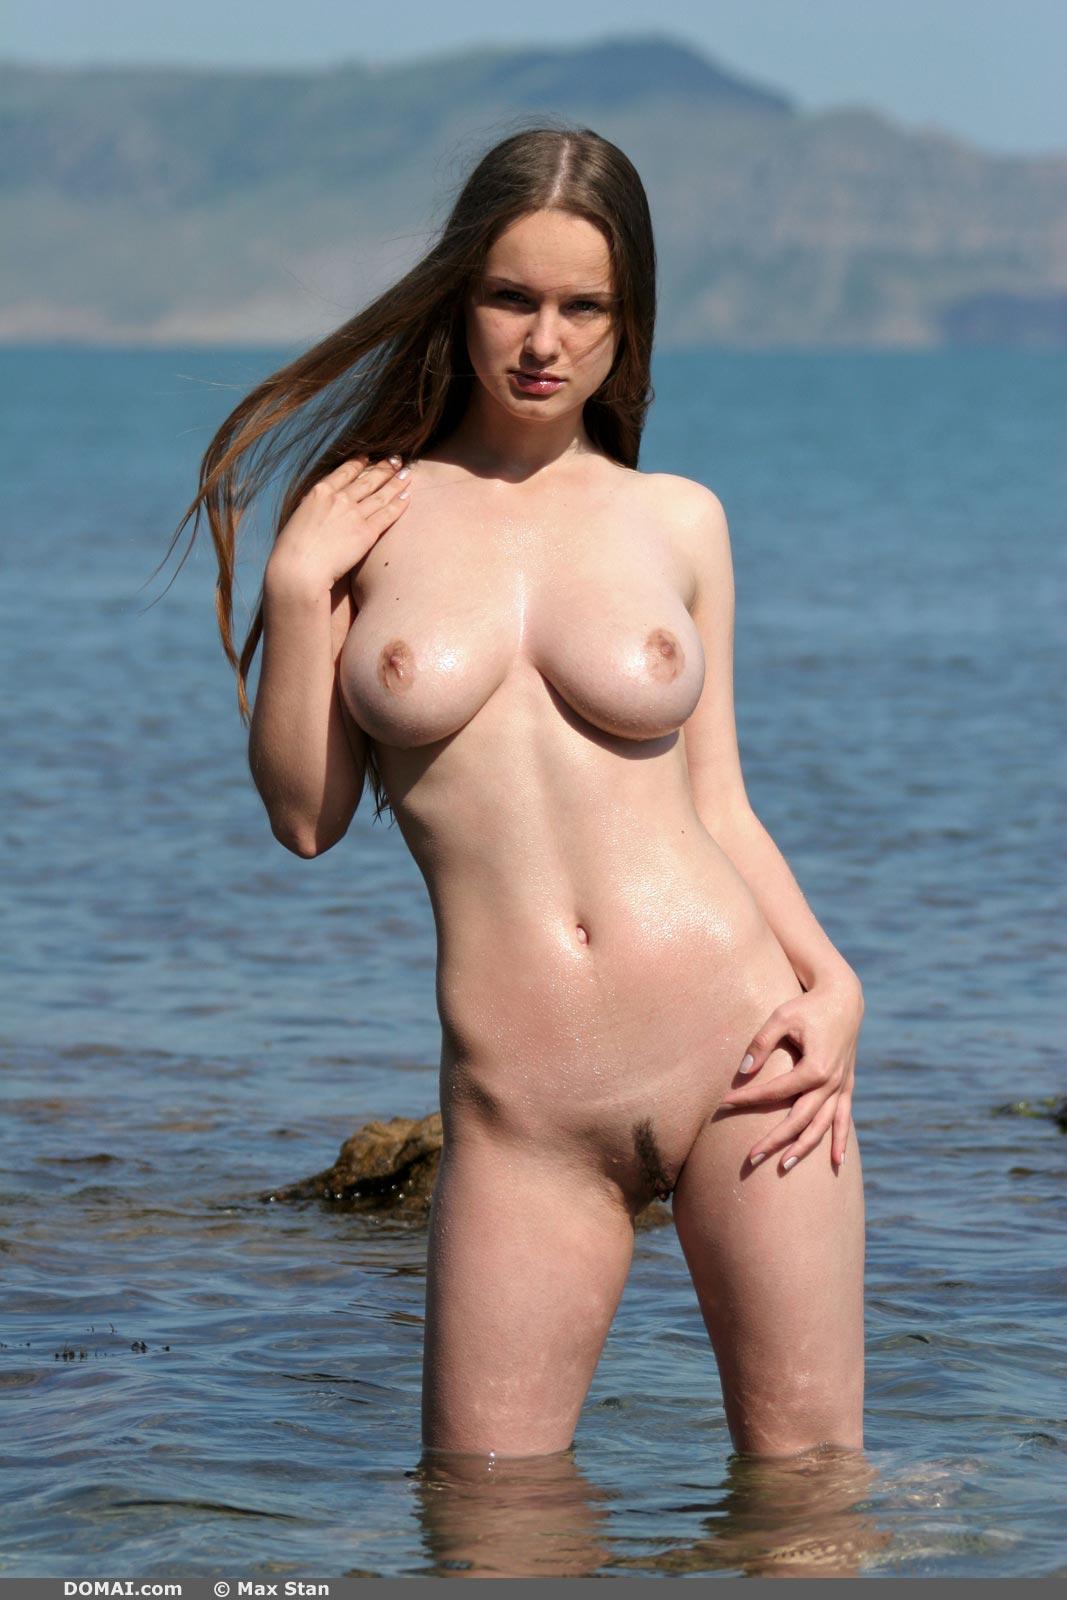 sascha wet and wild nudespuri com